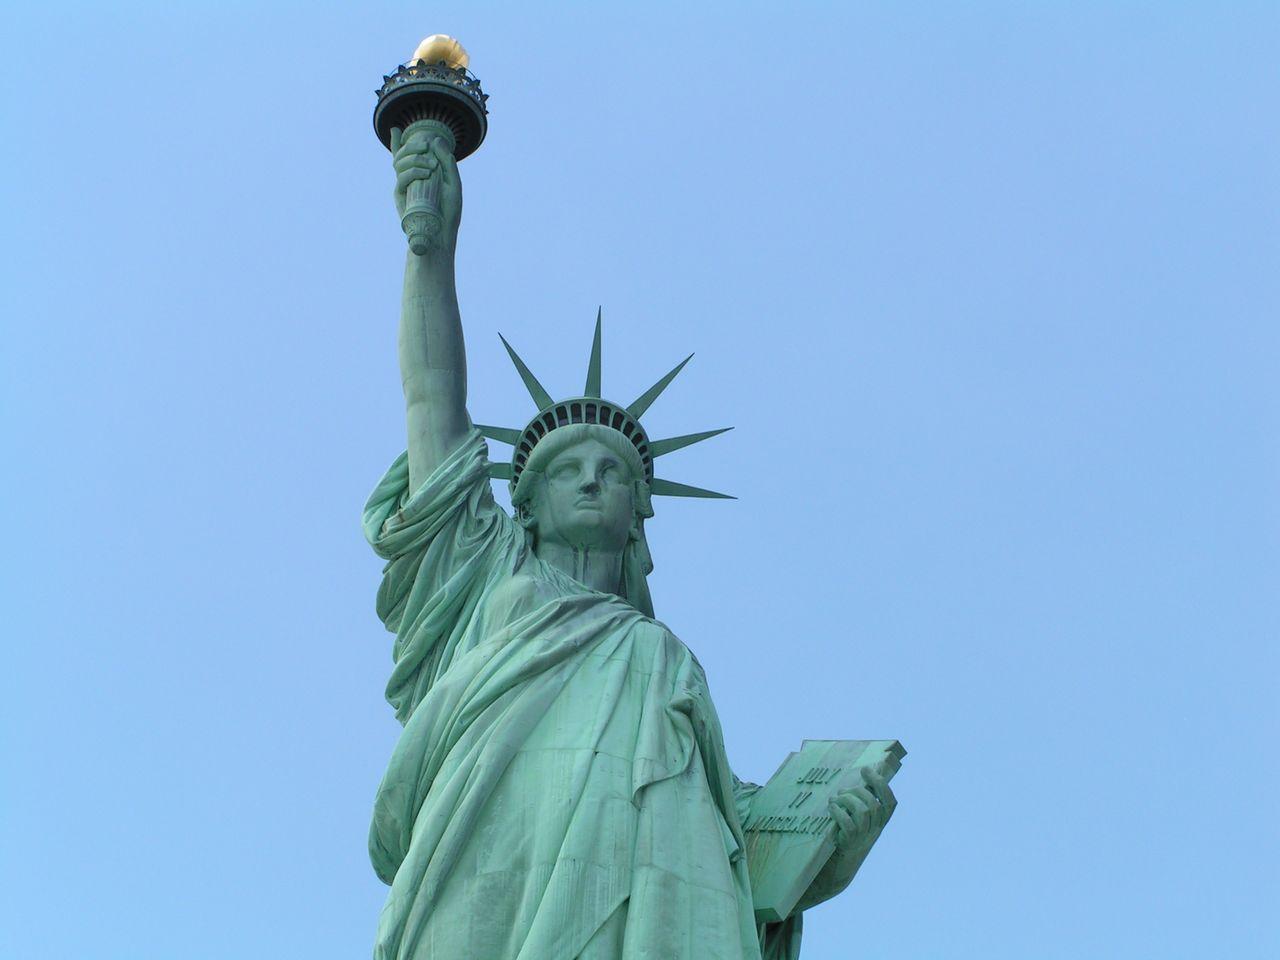 Statue of Liberty Wallpaper 1280x960